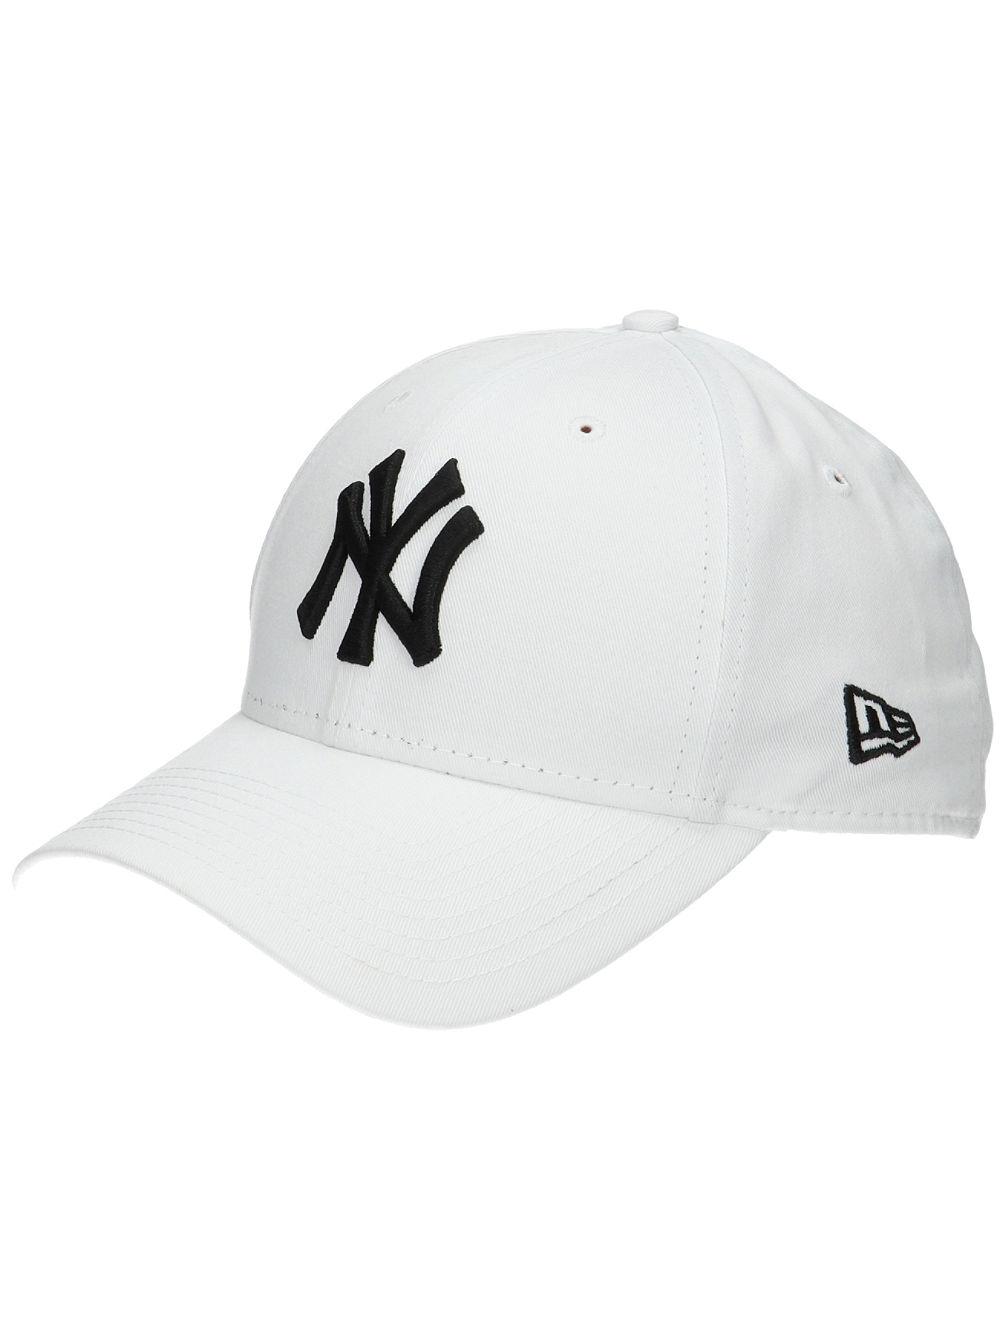 Buy New Era 940 League Basic NY Yankees Cap online at blue-tomato.com 4a9988b6f628